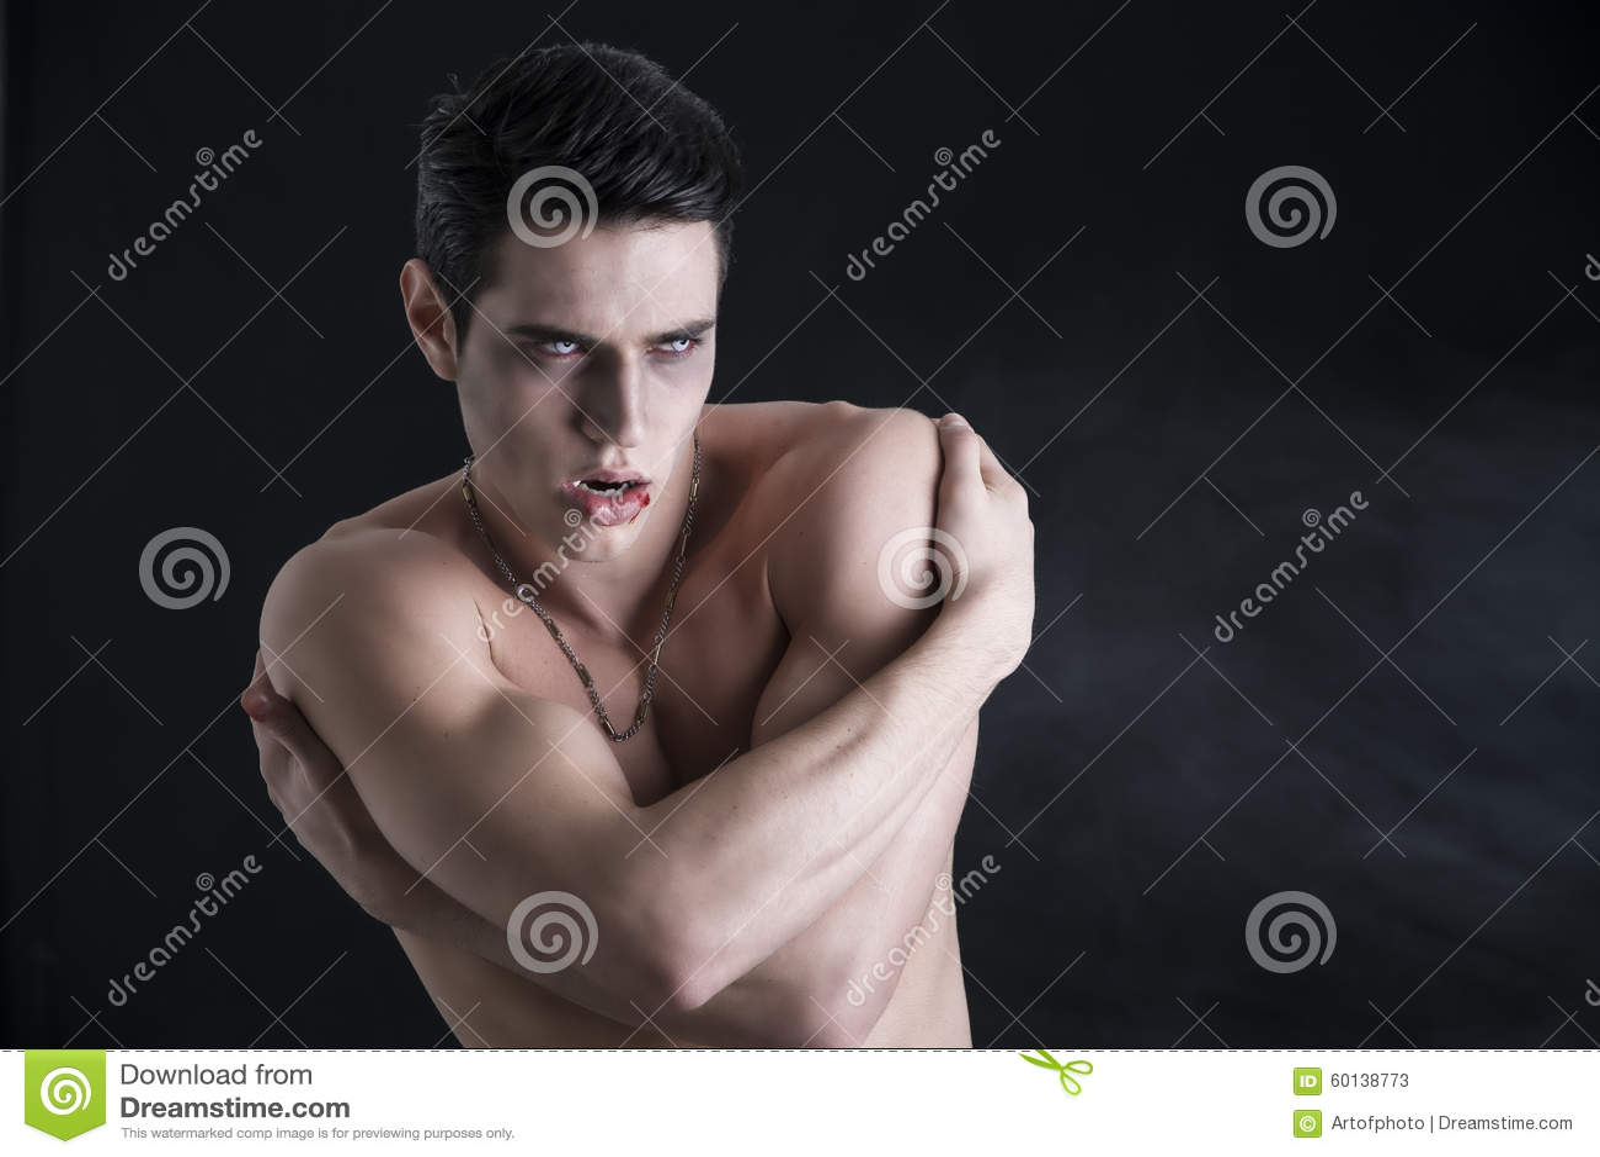 noah hathaway gay